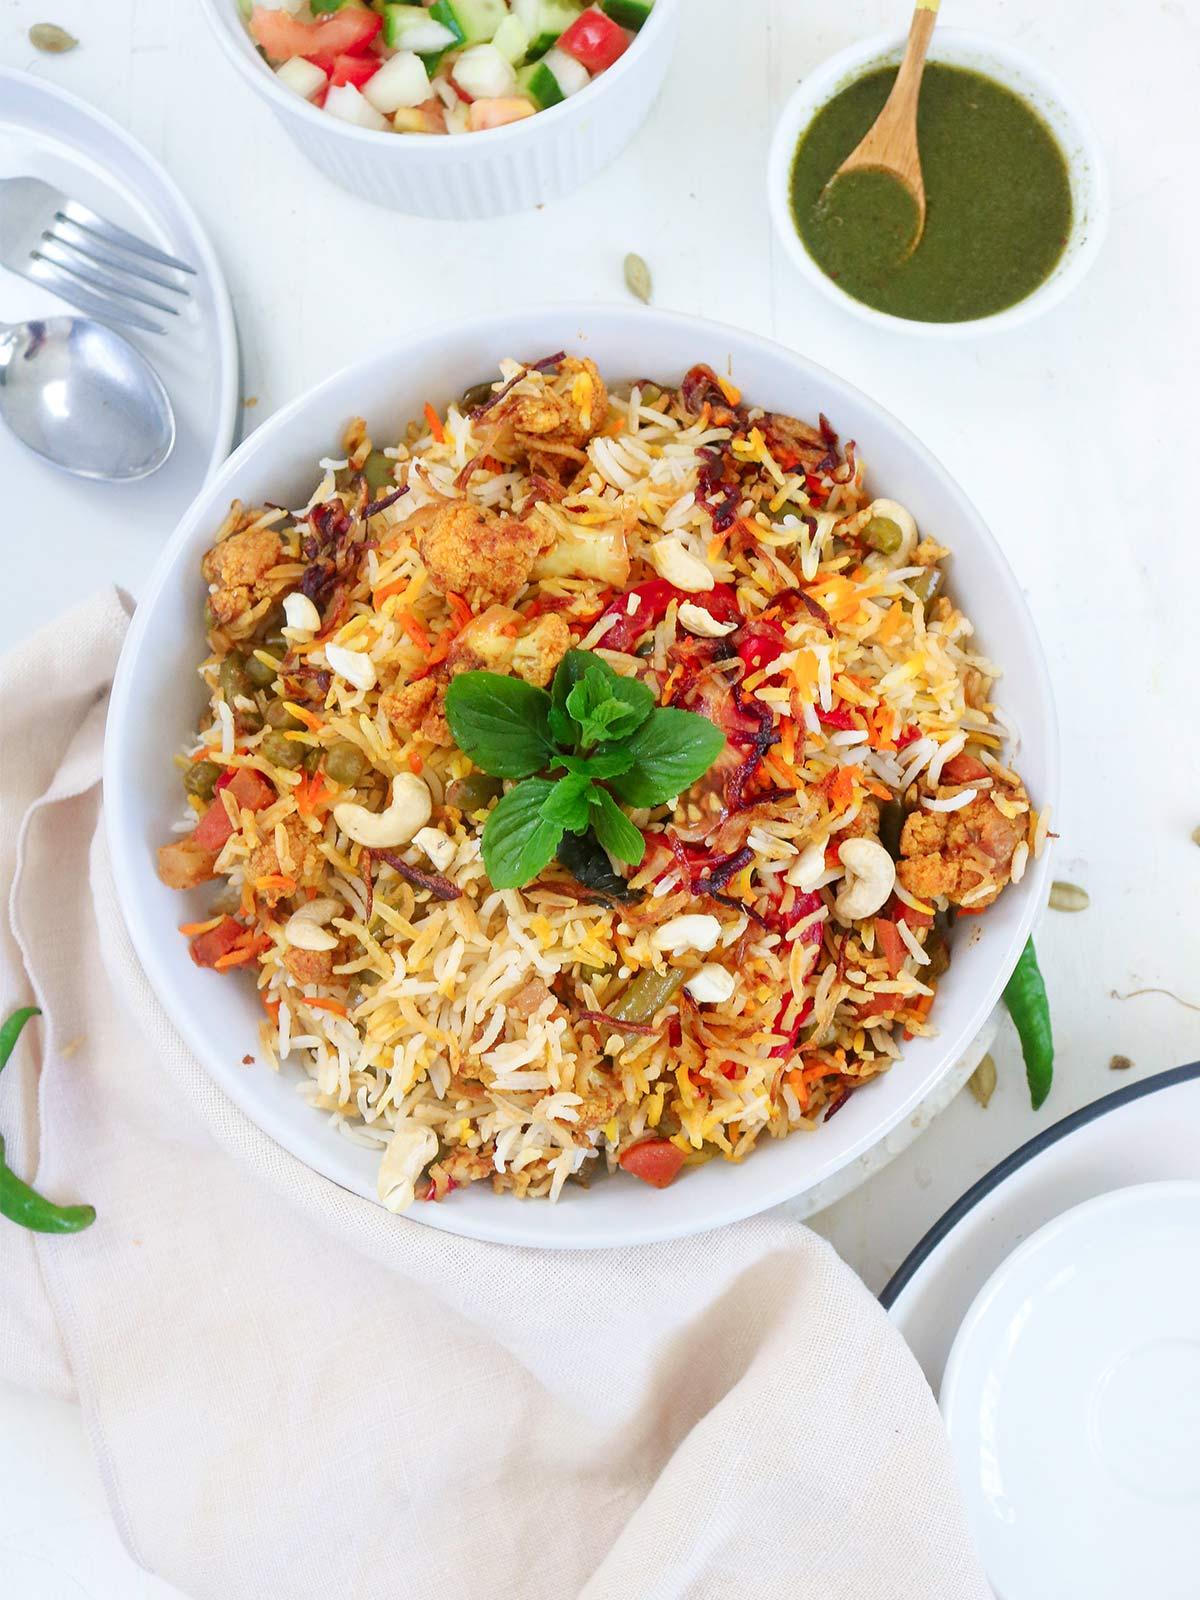 vegan biryani with green mint sauce